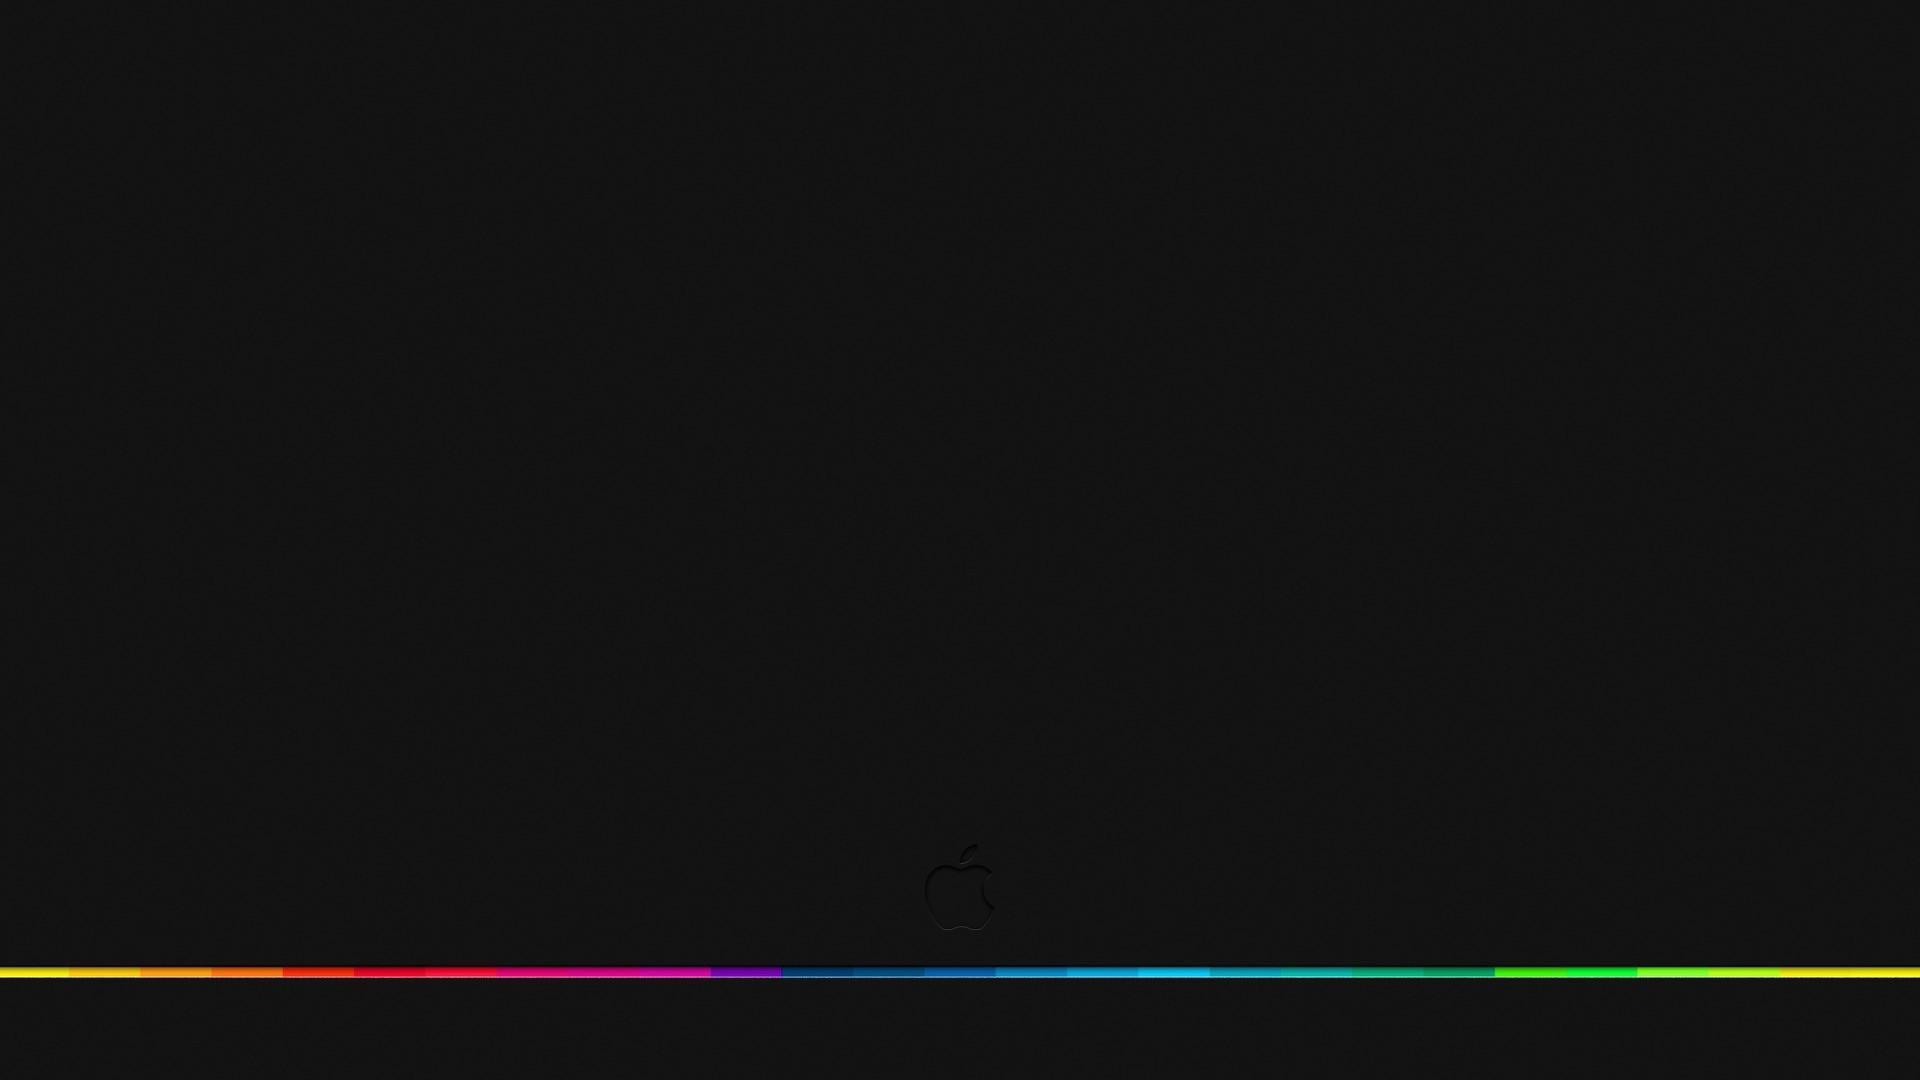 Cool Black Desktop Wallpapers